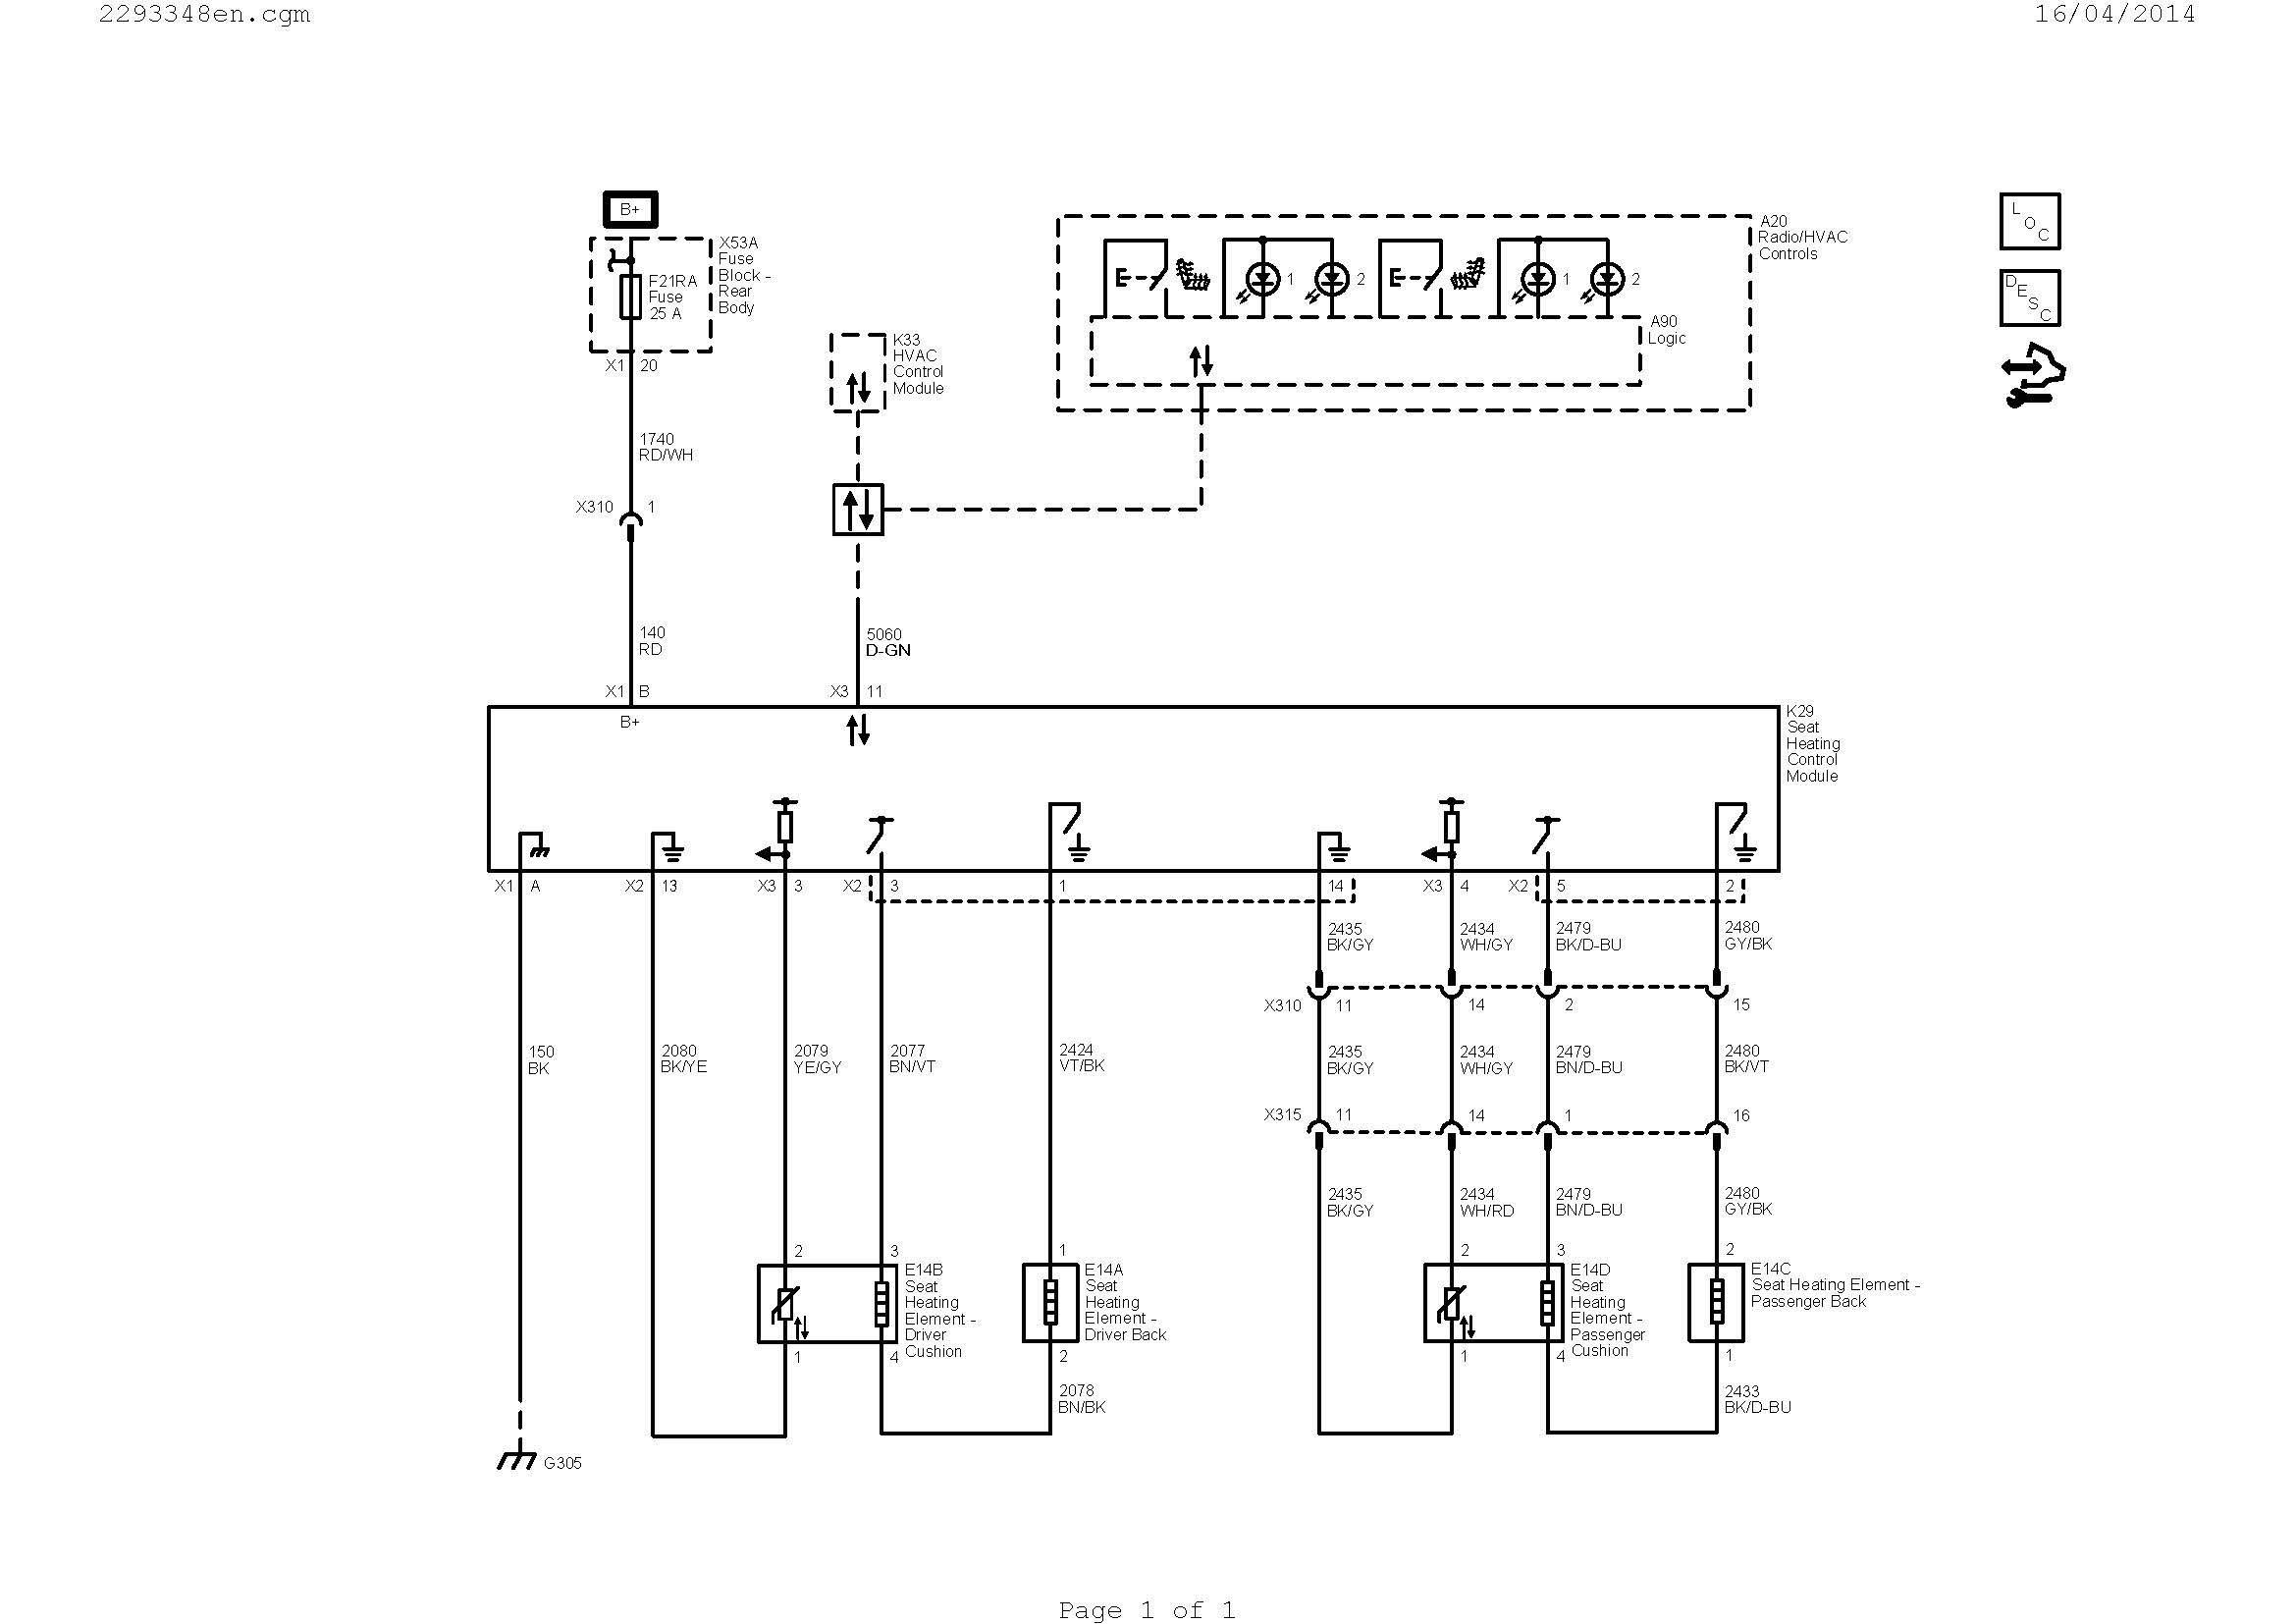 residential wiring diagram software Download-Hvac Wiring Diagram software Wiring Diagrams for Electrical New Wiring Diagram Guitar Fresh Hvac Diagram 17-i